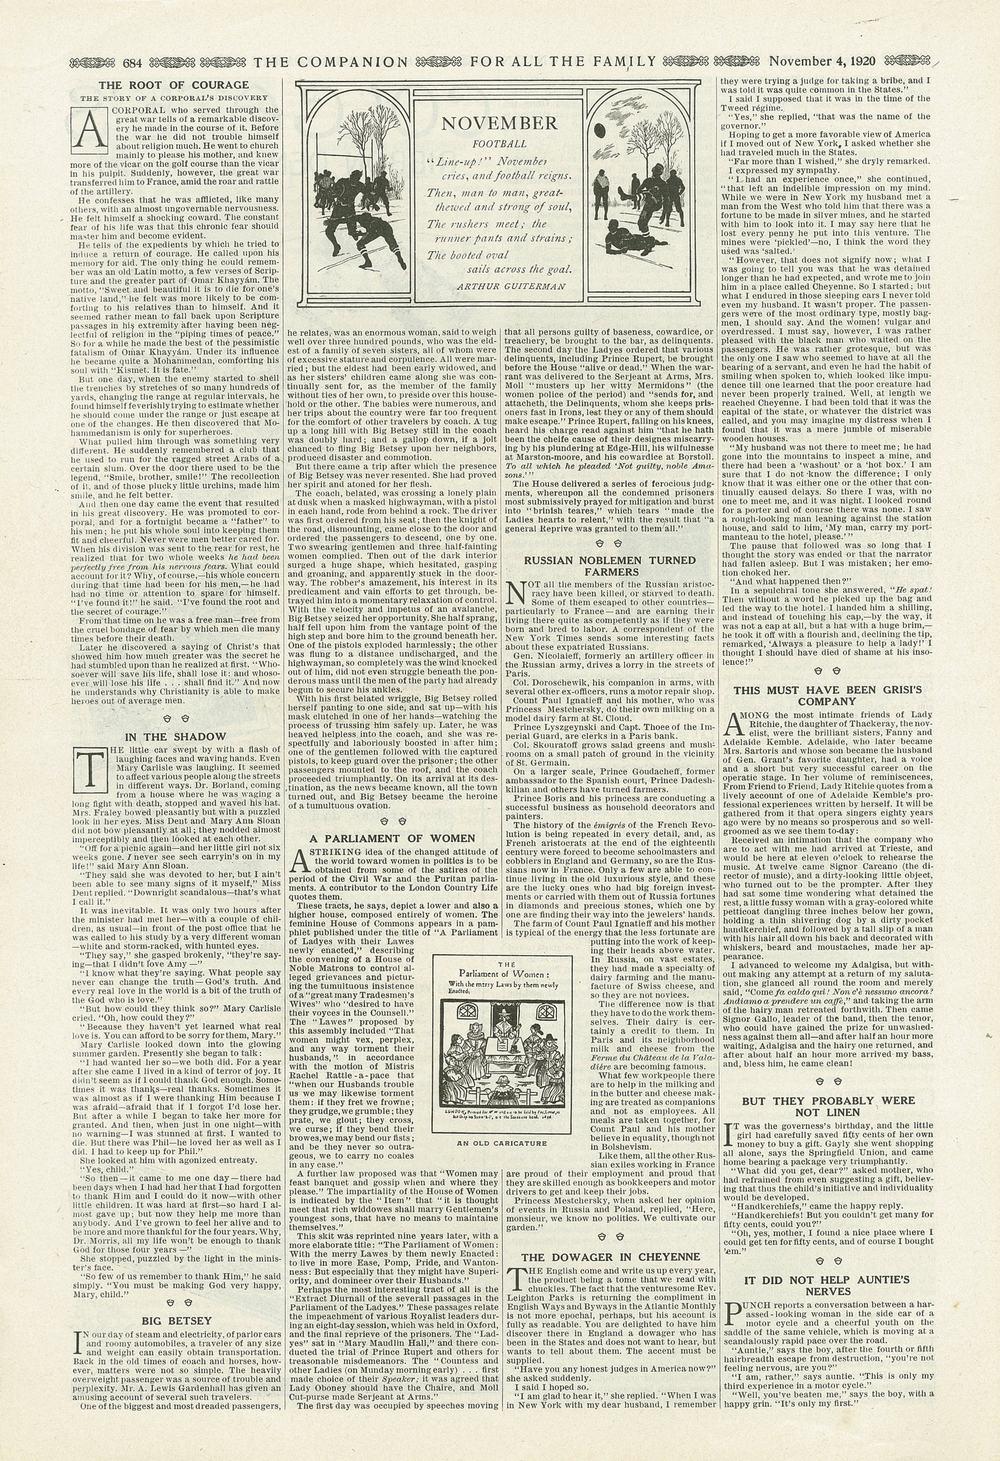 The Youth's Companion - November 4th, 1920 - Vol. 94 - No. 45